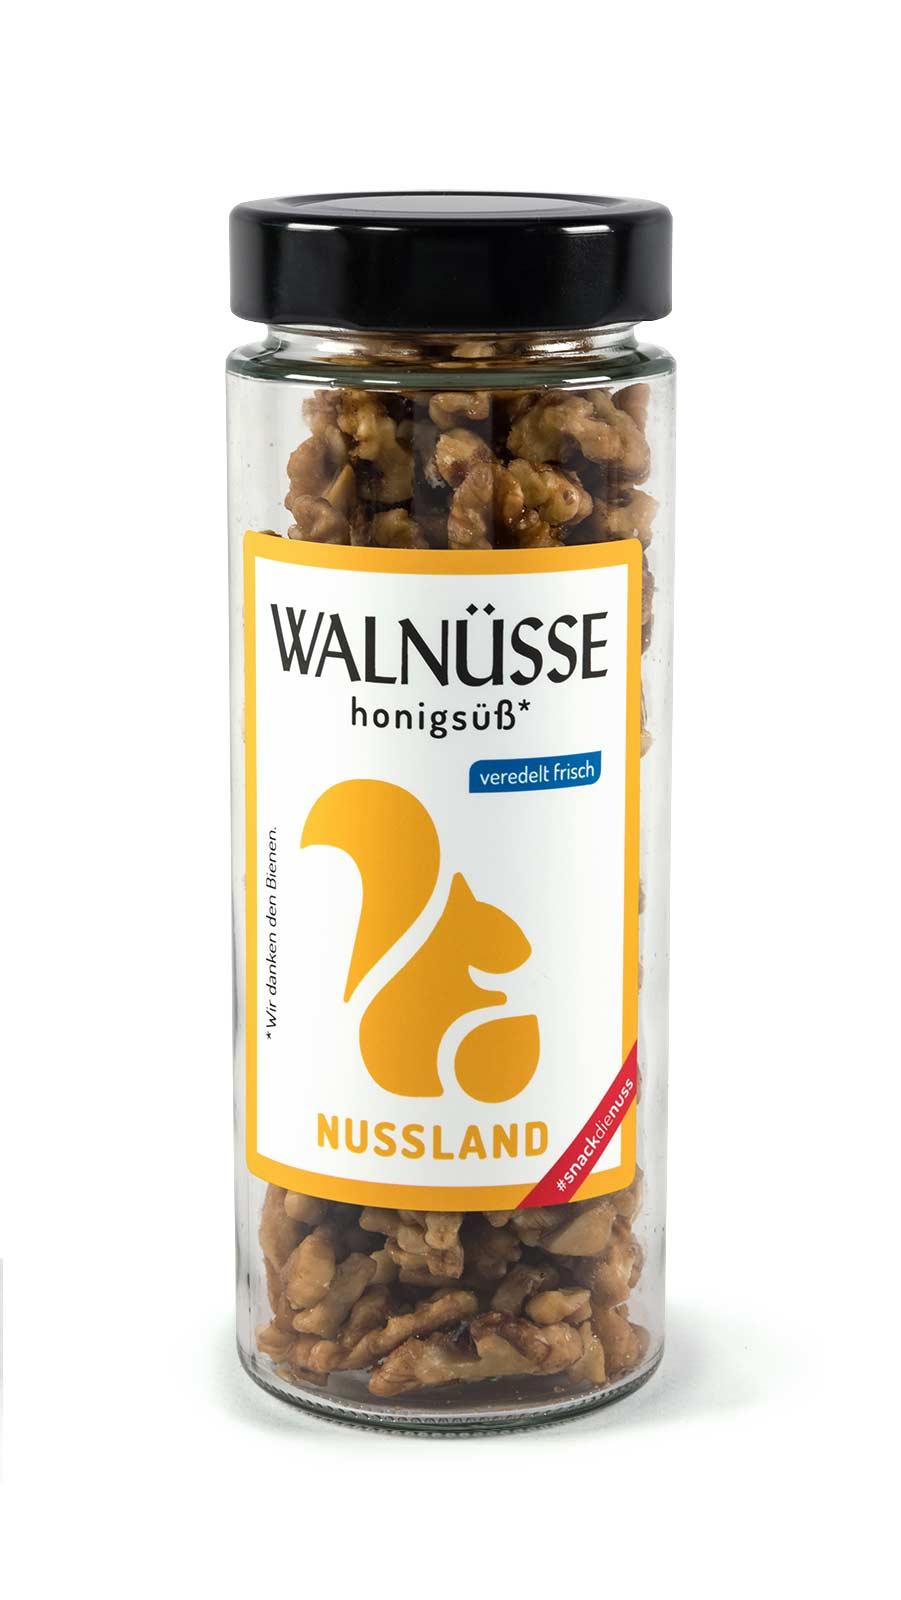 Walnuss-Snack 'Honigsüß'